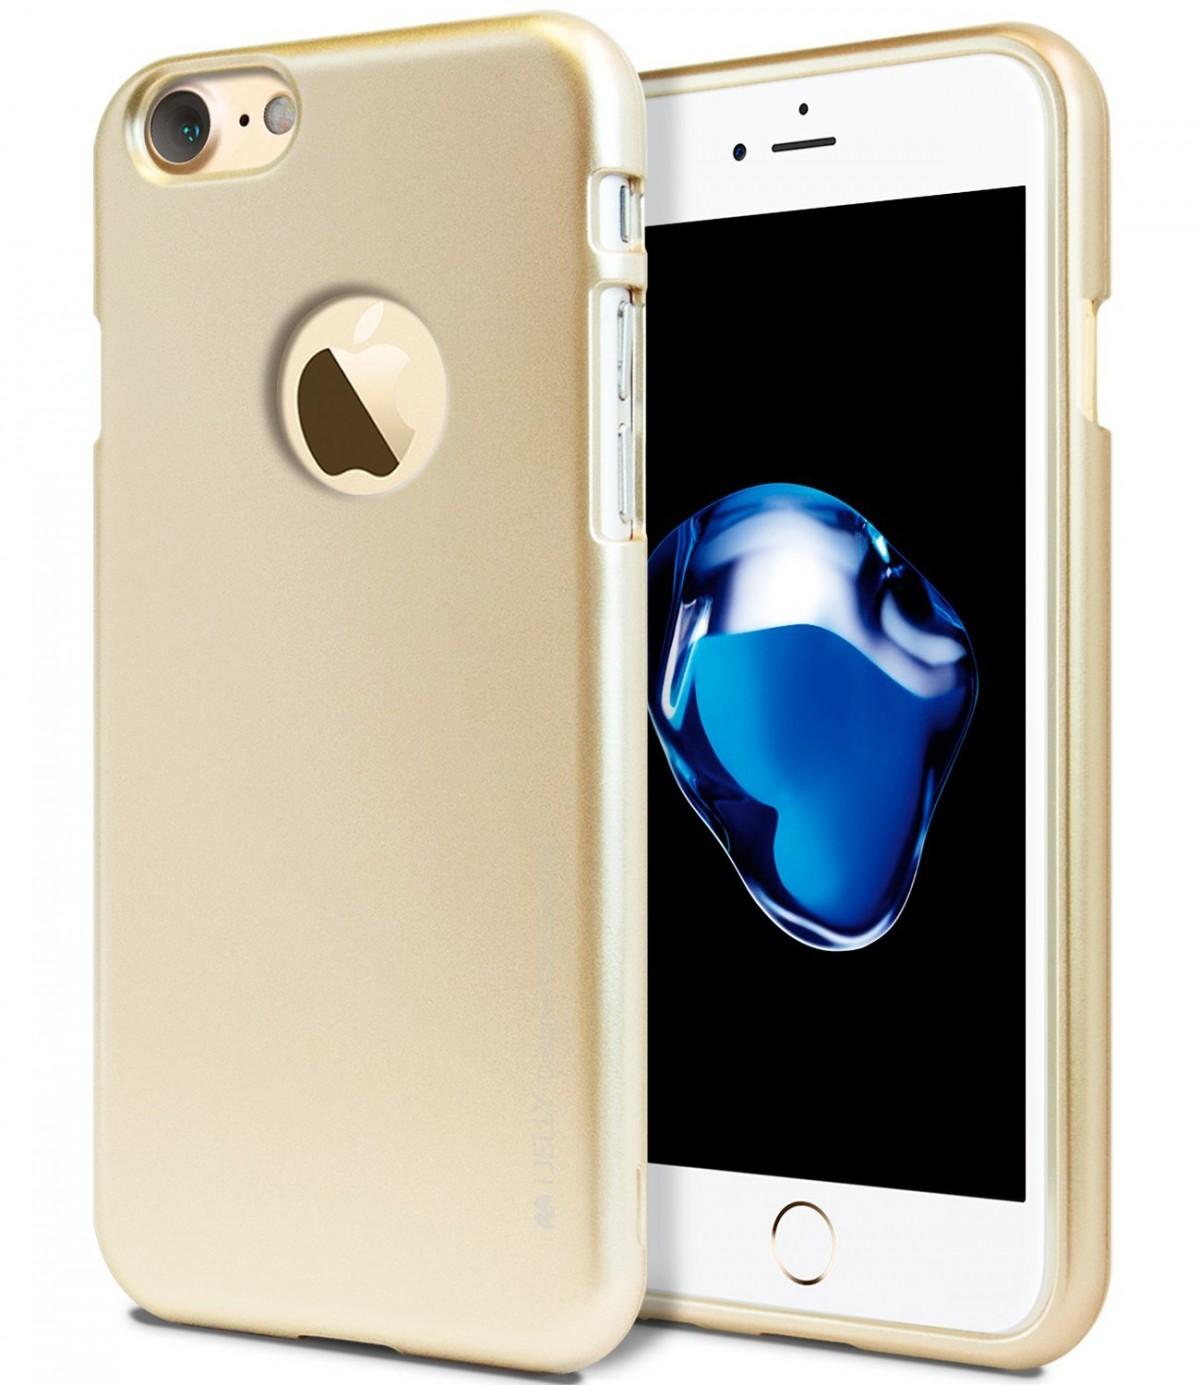 Tenké silikonové obaly / kryty Goospery Mercury pro Apple iPhone 7 - iJelly Metal - Zlatý / Gold